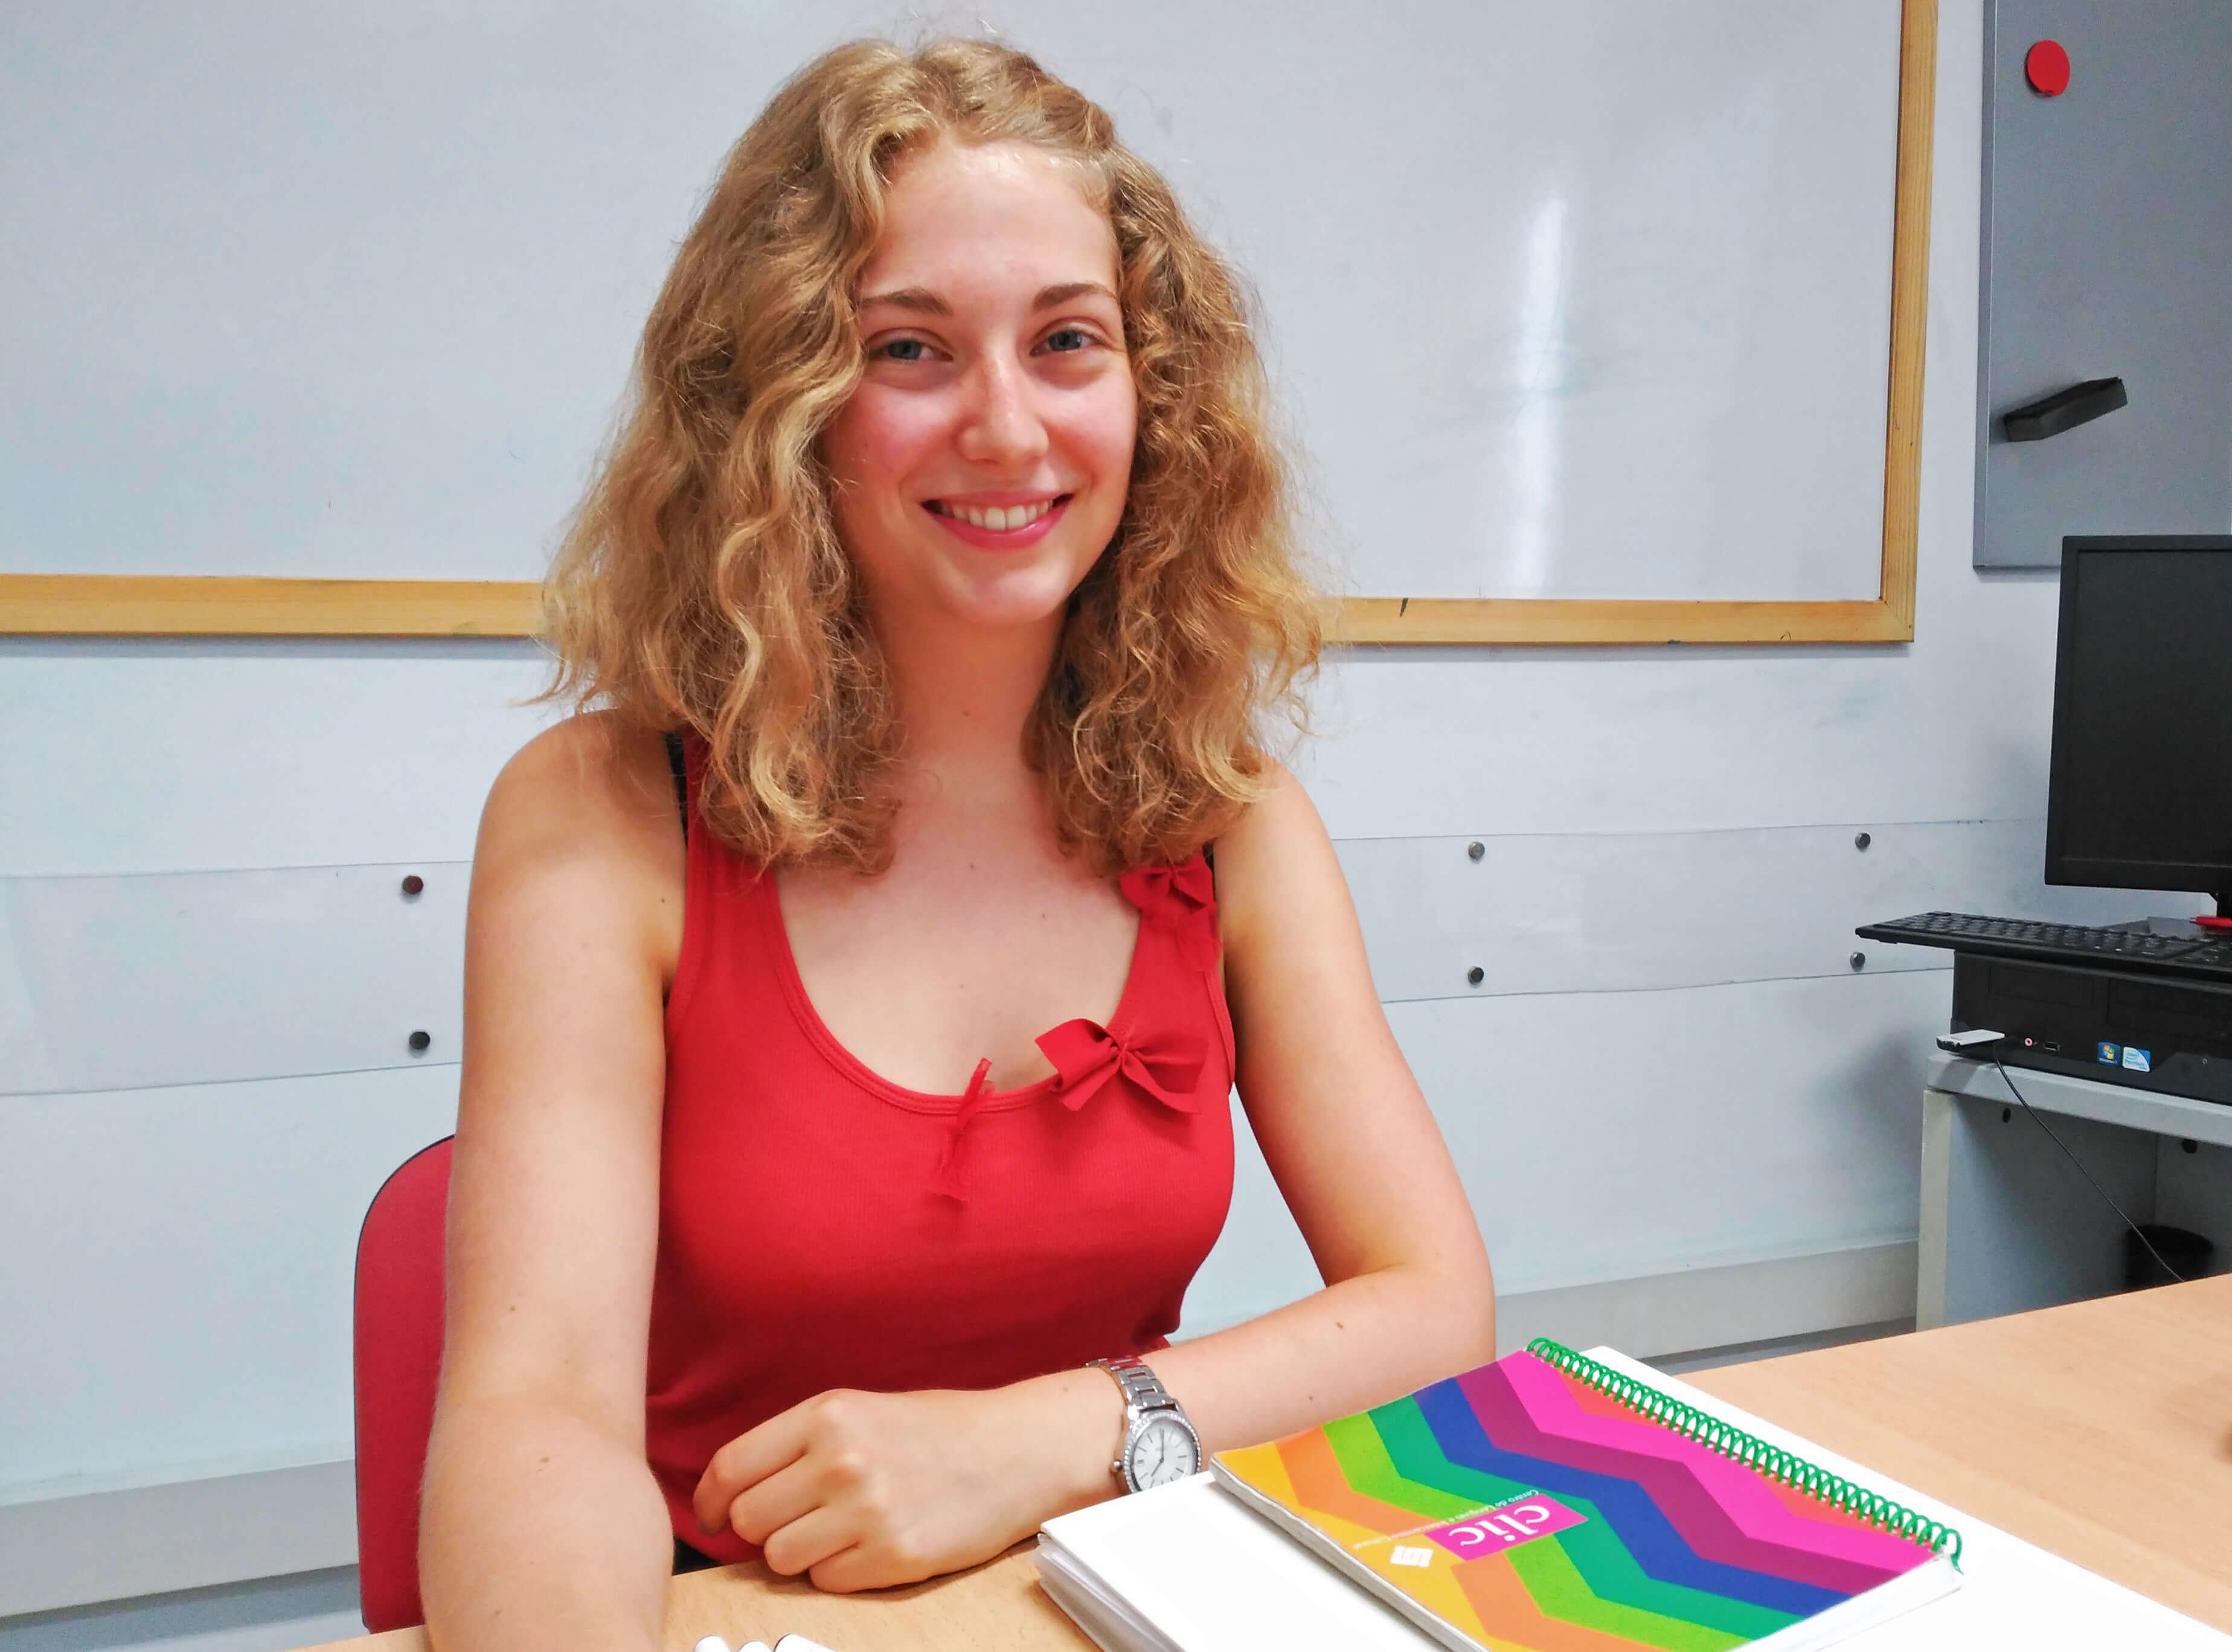 El estudiante de la semana: CLIC International House Cádiz